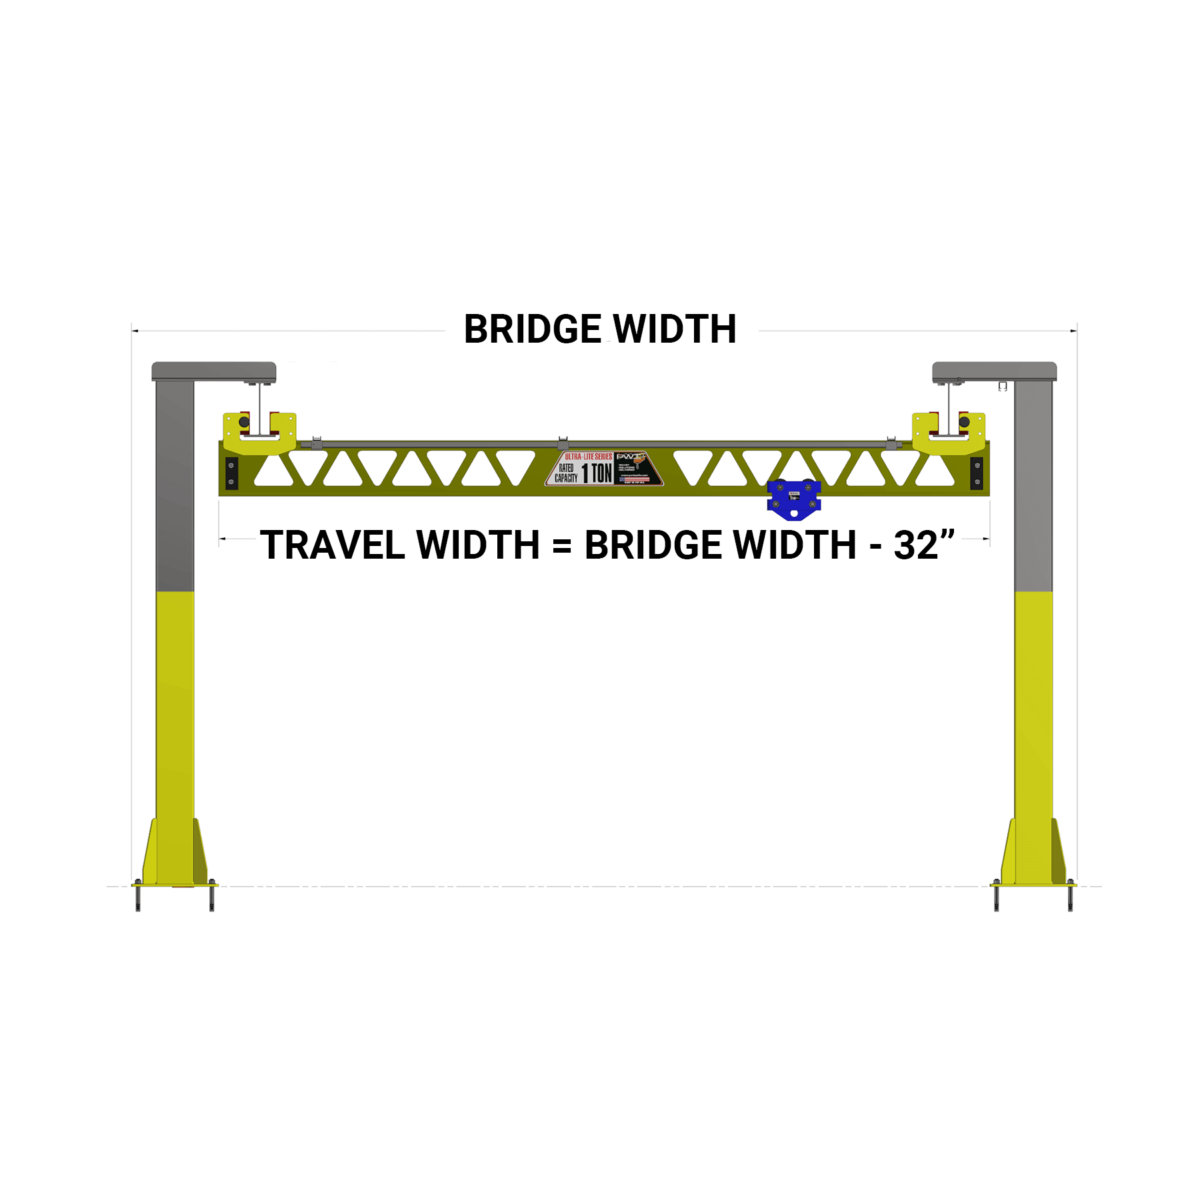 PWI Ultra-Lite Freestanding Bridge Crane Overall System Width